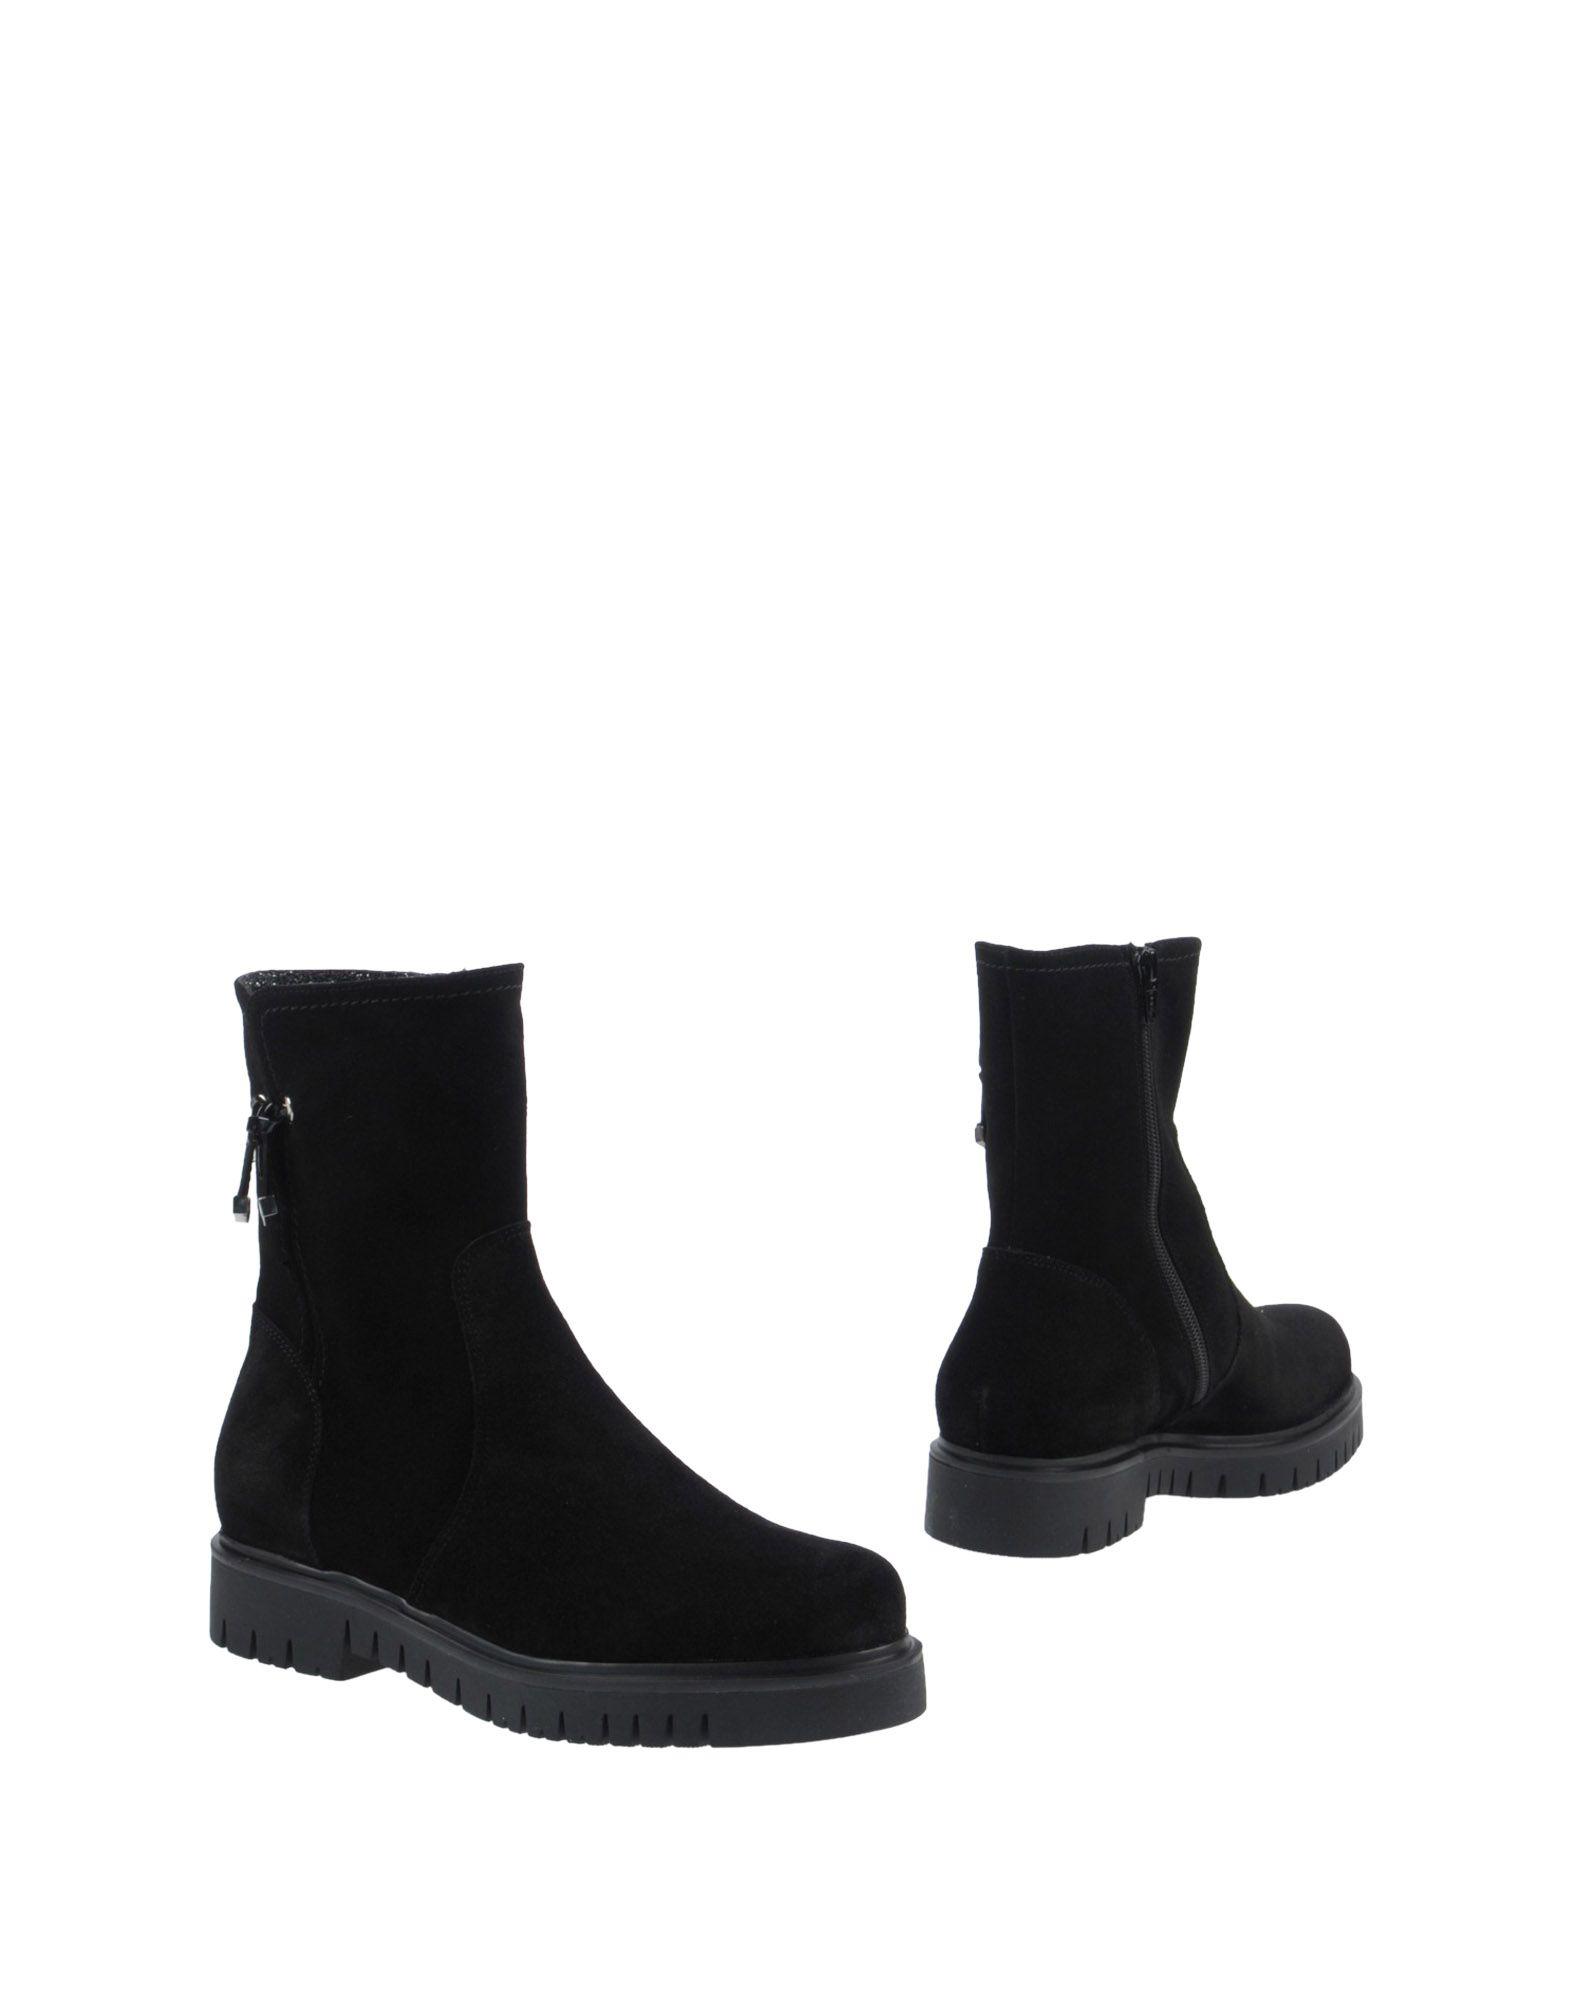 Rabatt Schuhe Norma J.Baker Stiefelette 11447120LD Damen  11447120LD Stiefelette 52e816